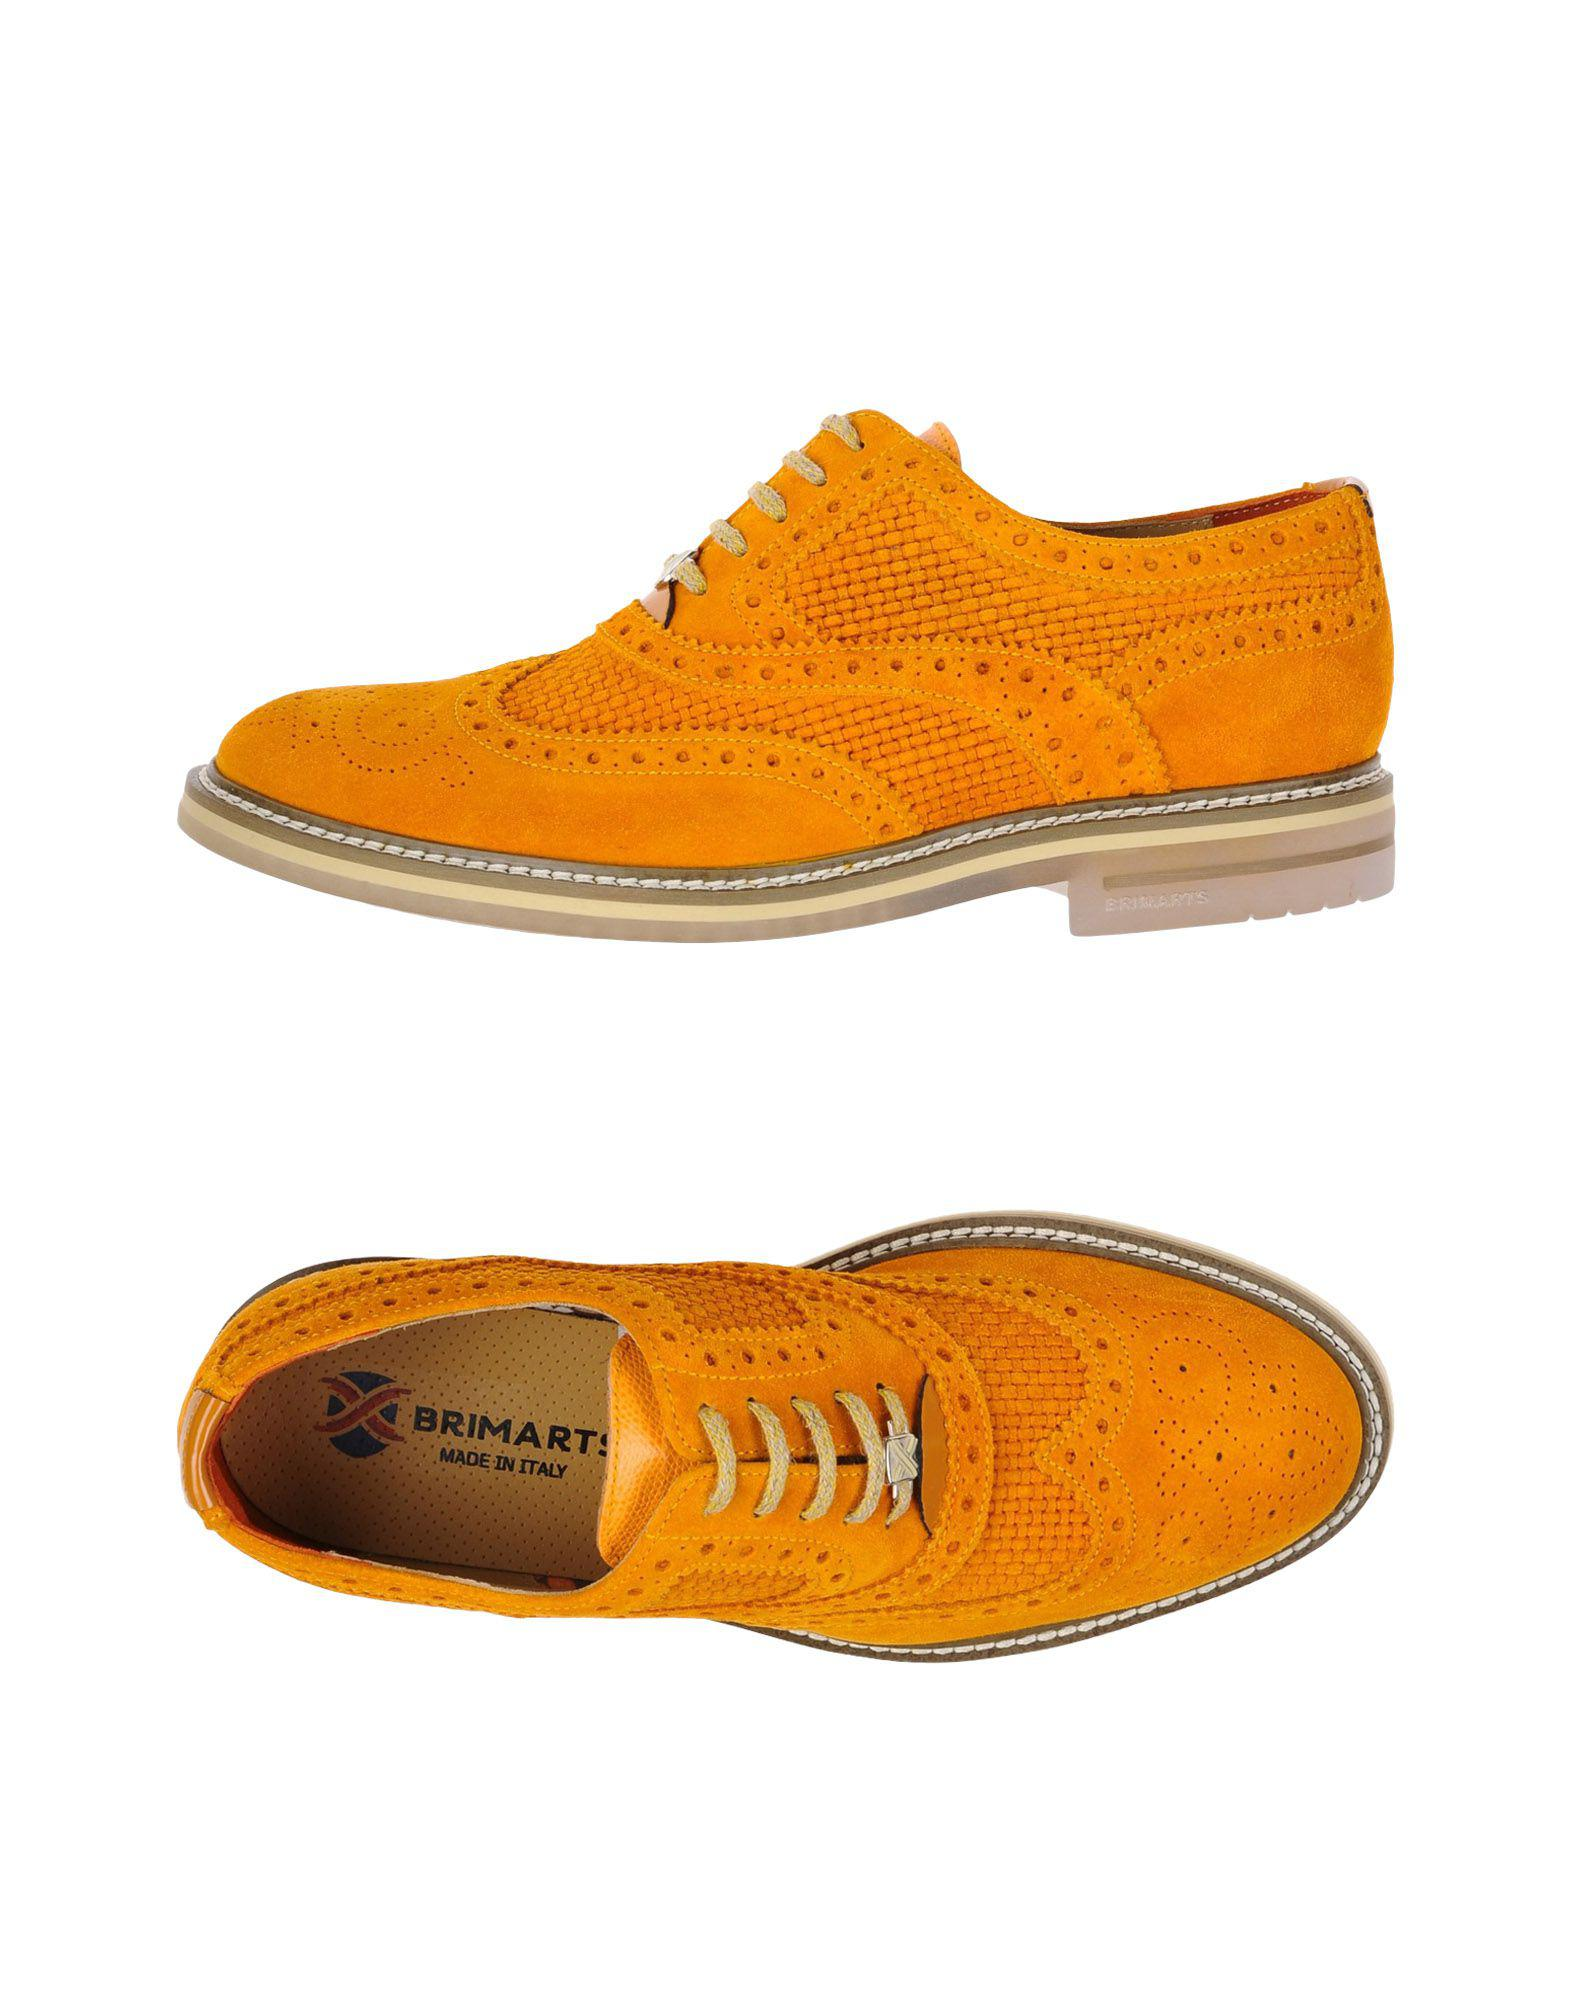 BRIMARTS Laced shoes Orange Men